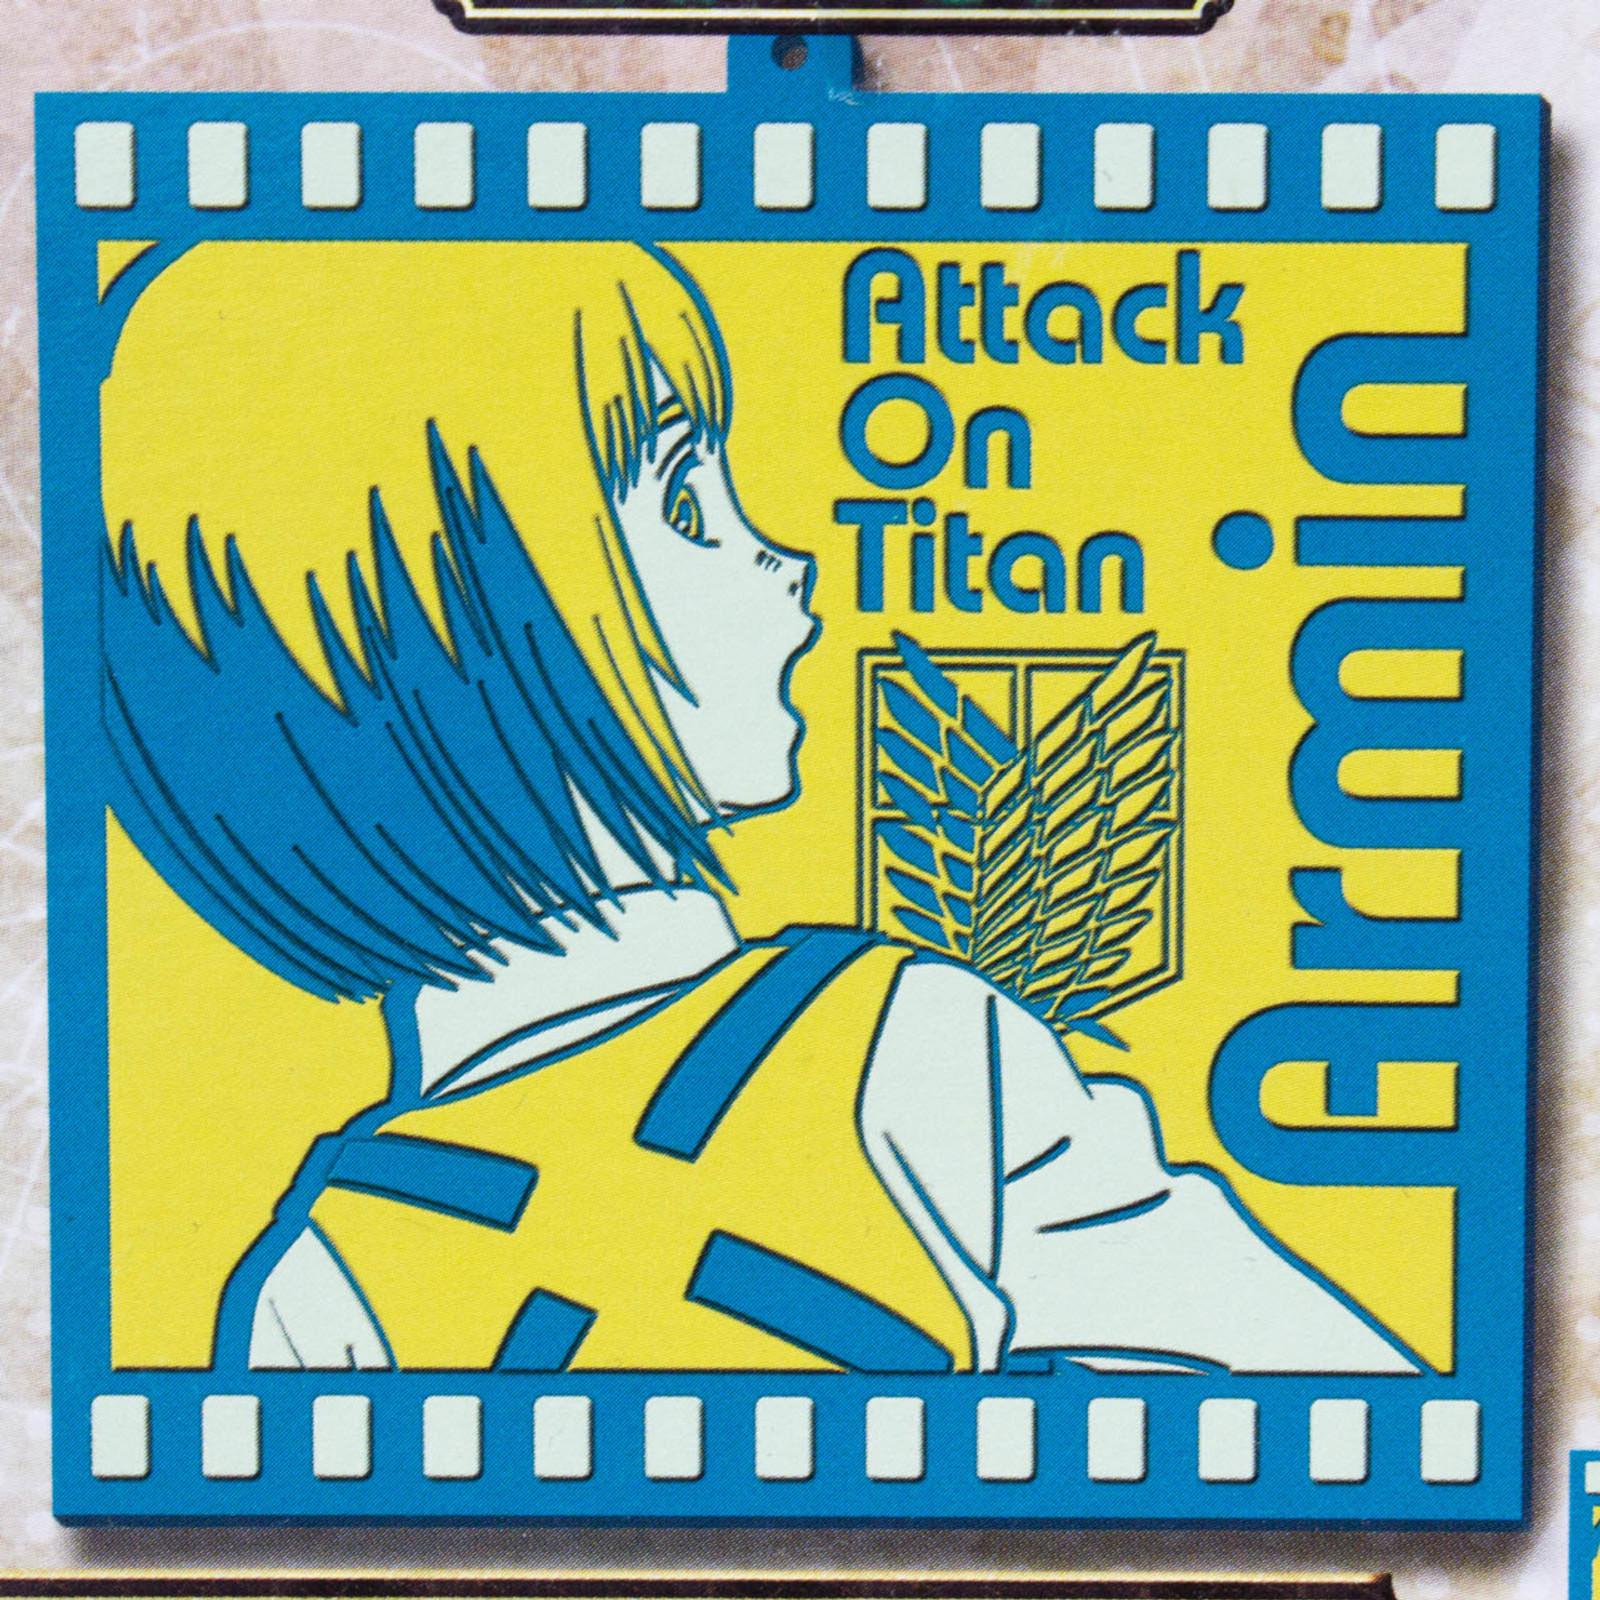 Attack on Titan Rubber Coaster Armin Arlert Banpresto JAPAN ANIME MANGA